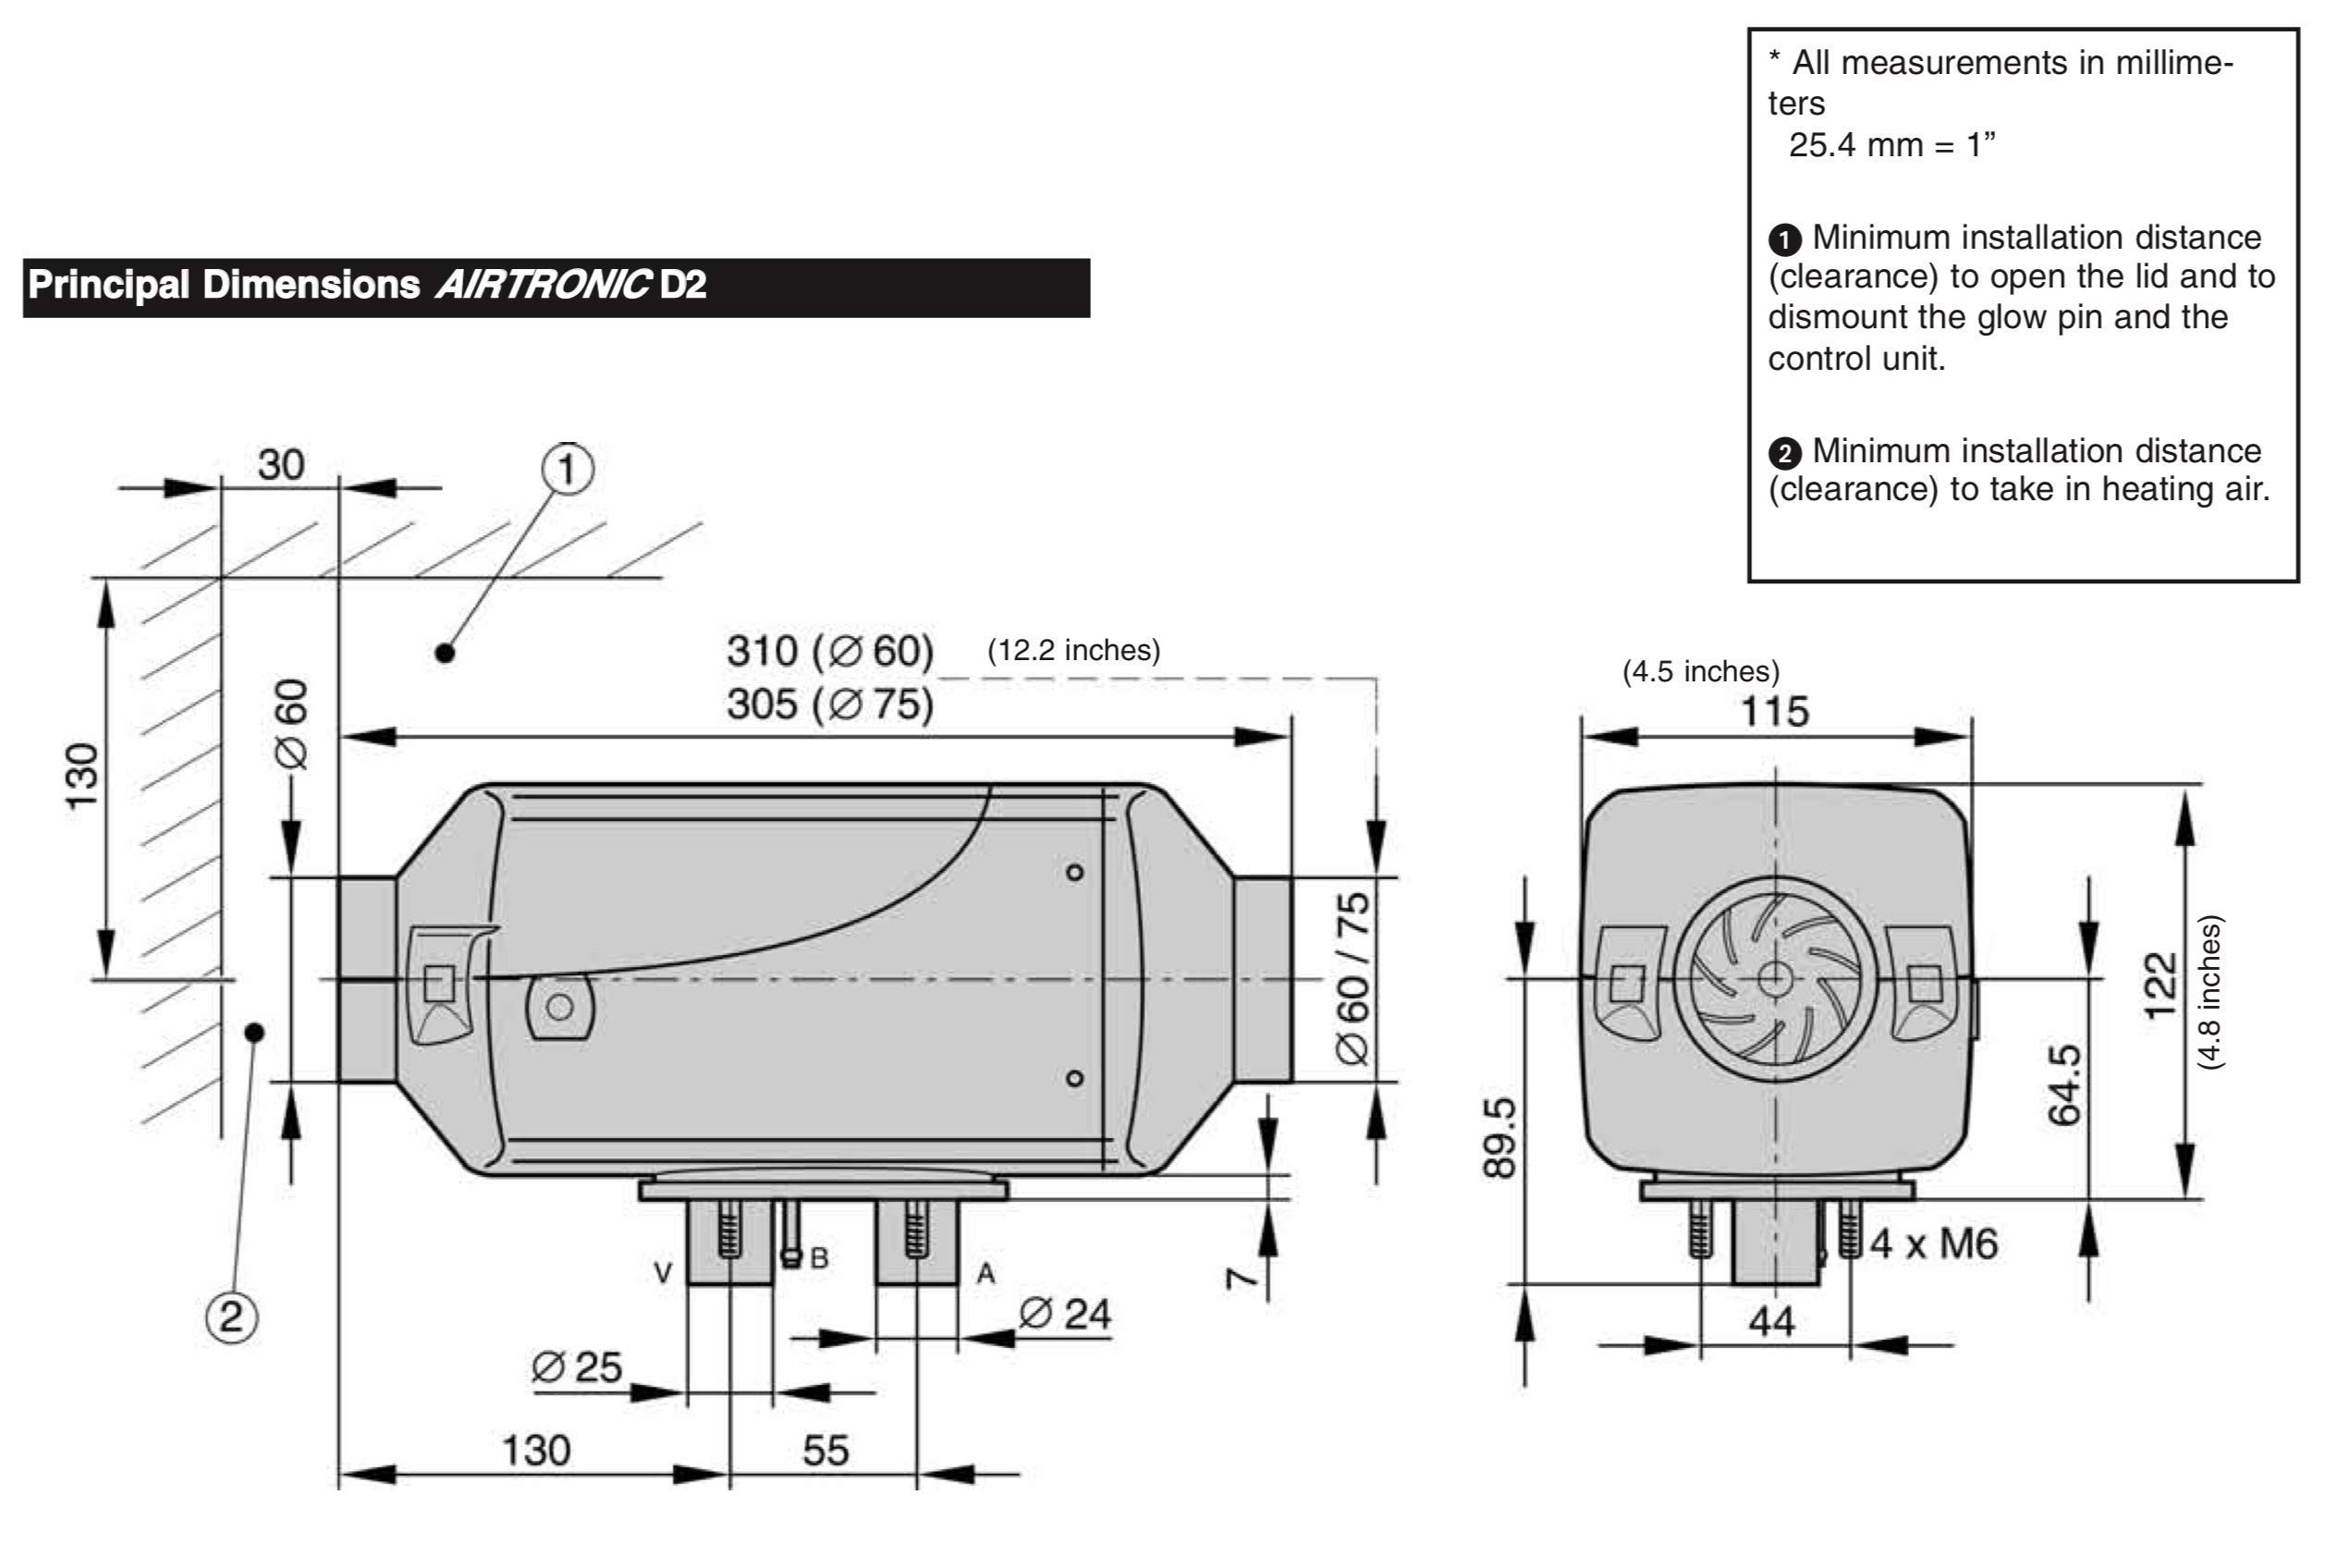 Eberspacher Espar Airtronic D2 air heater 12v Diesel with 80110003 control   292199018017   E8017 by Eberspacher